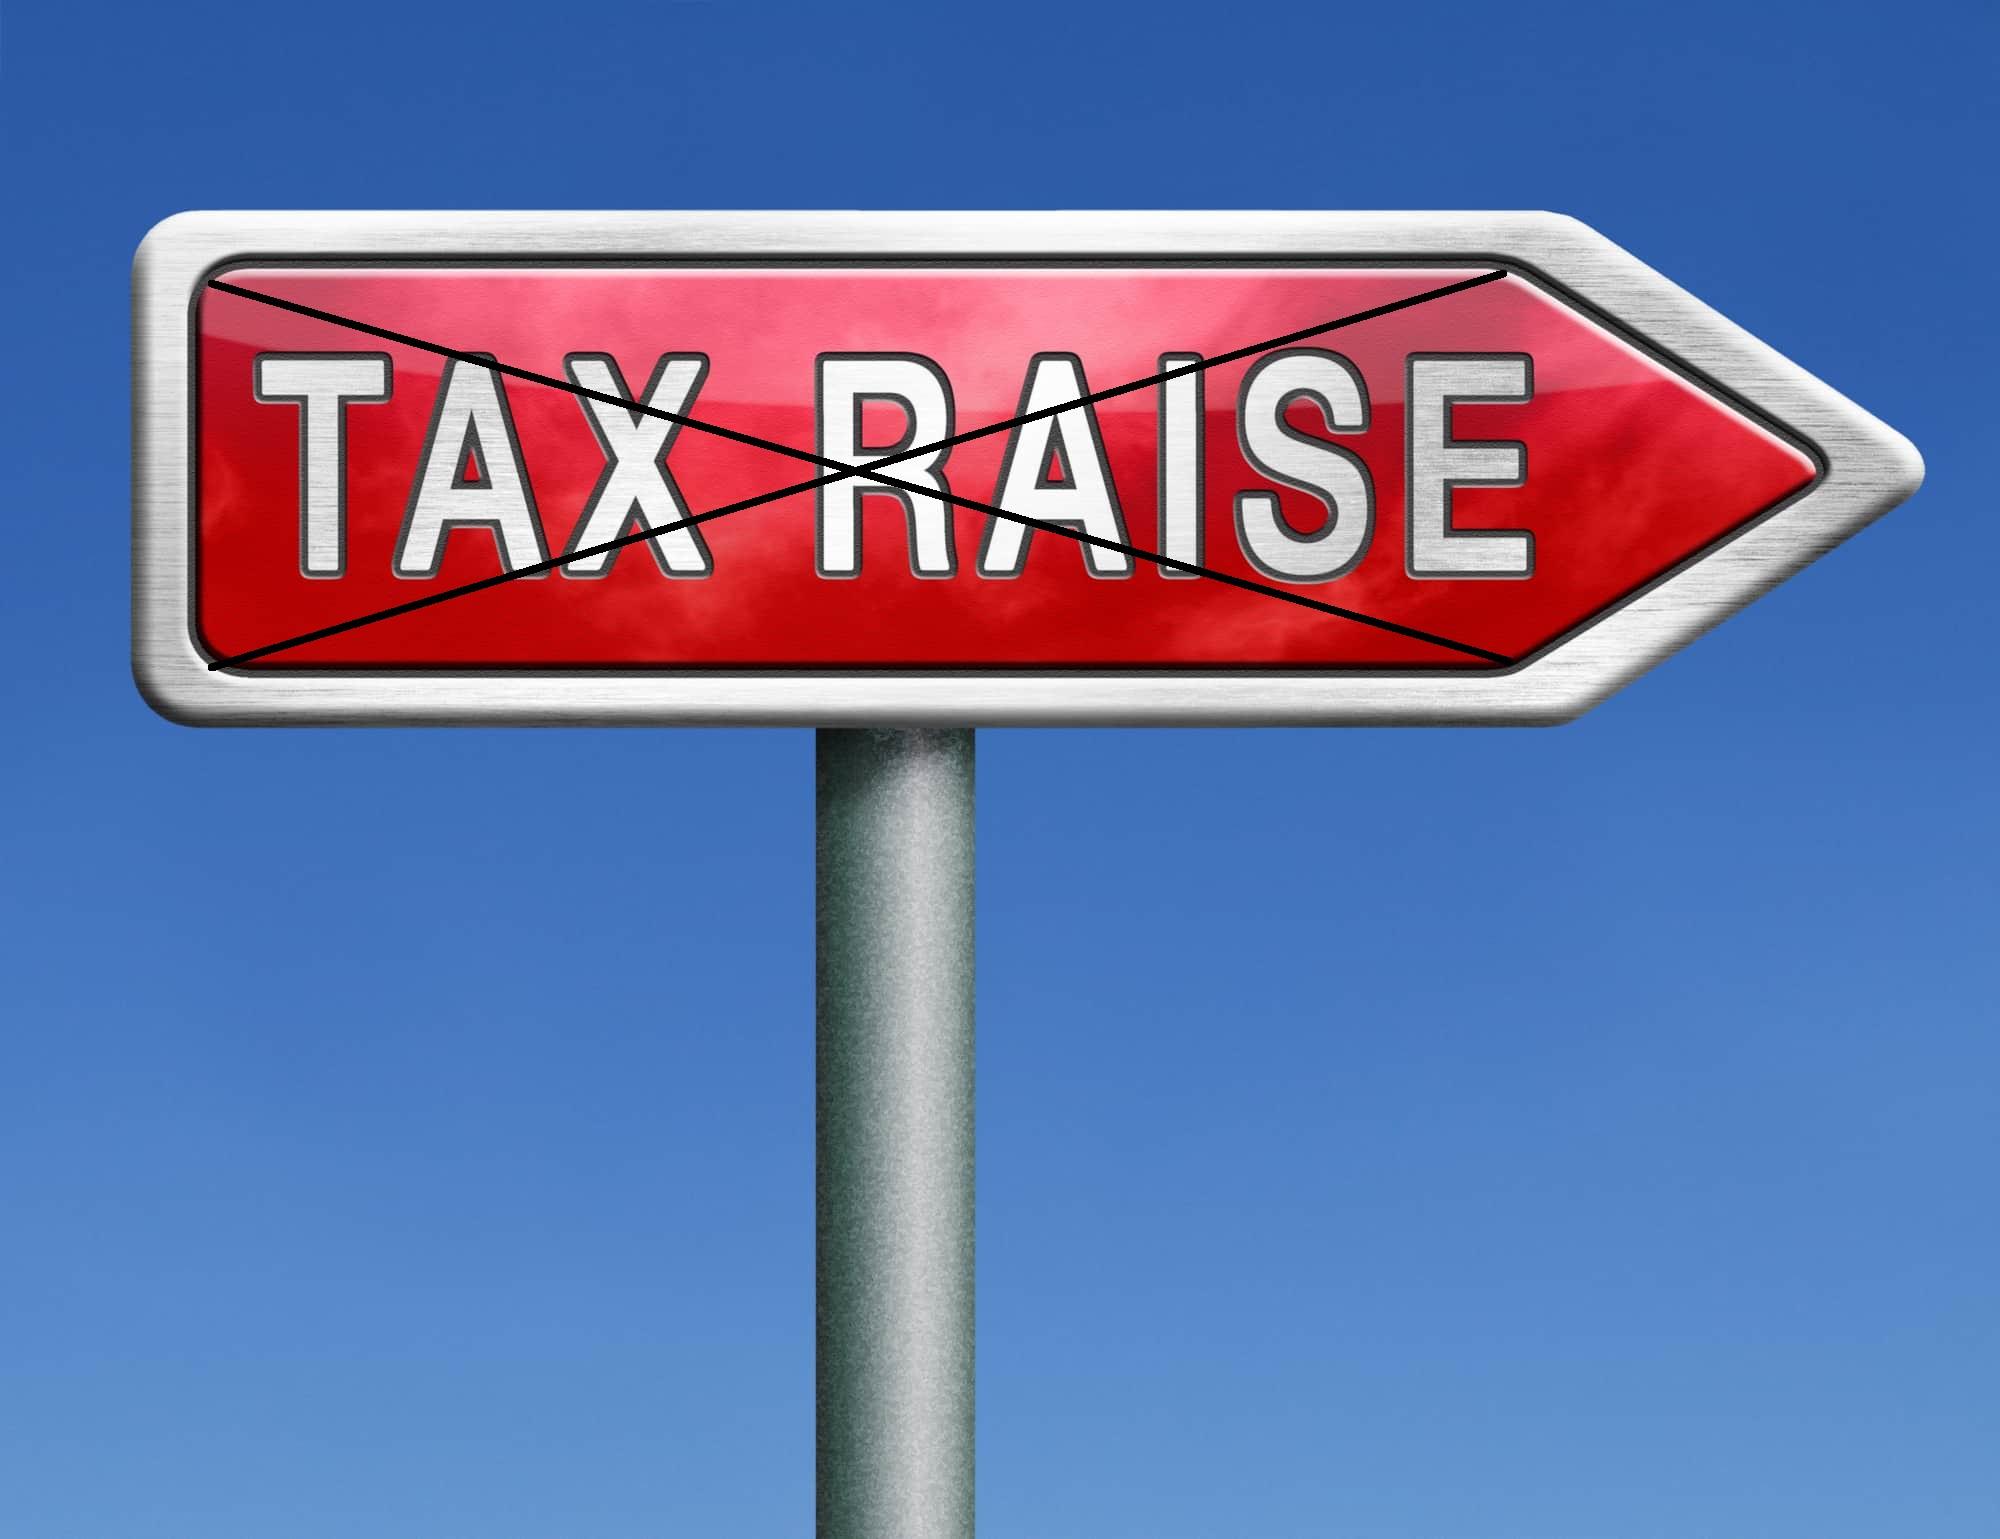 UAE Assures No VAT Increase Post Saudi's Increment Announcement